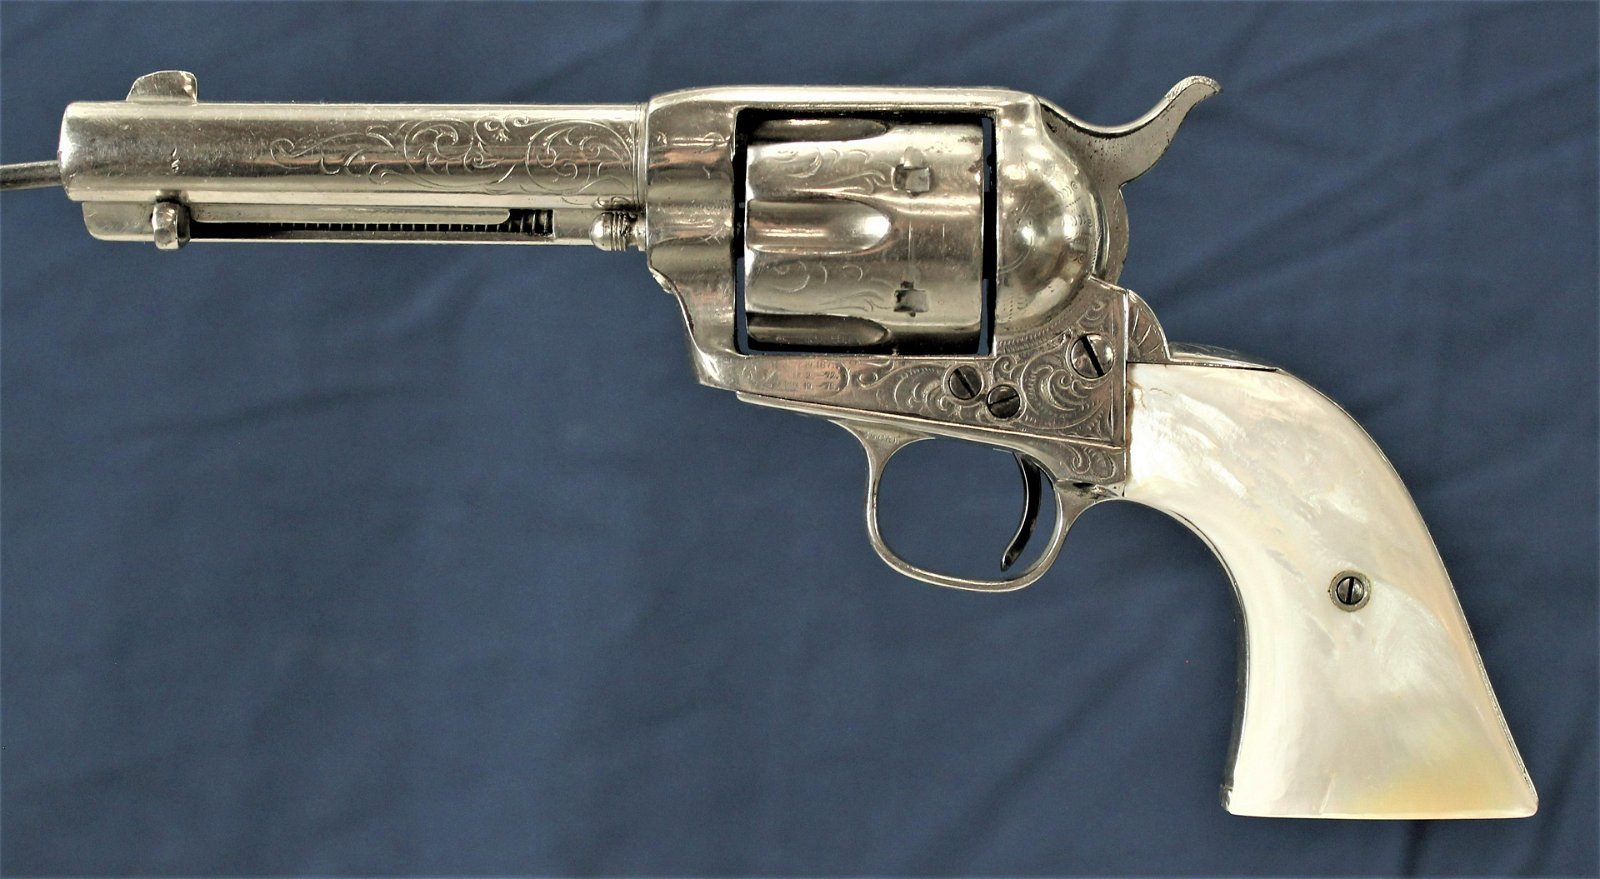 Engraved Colt SAA Revolver